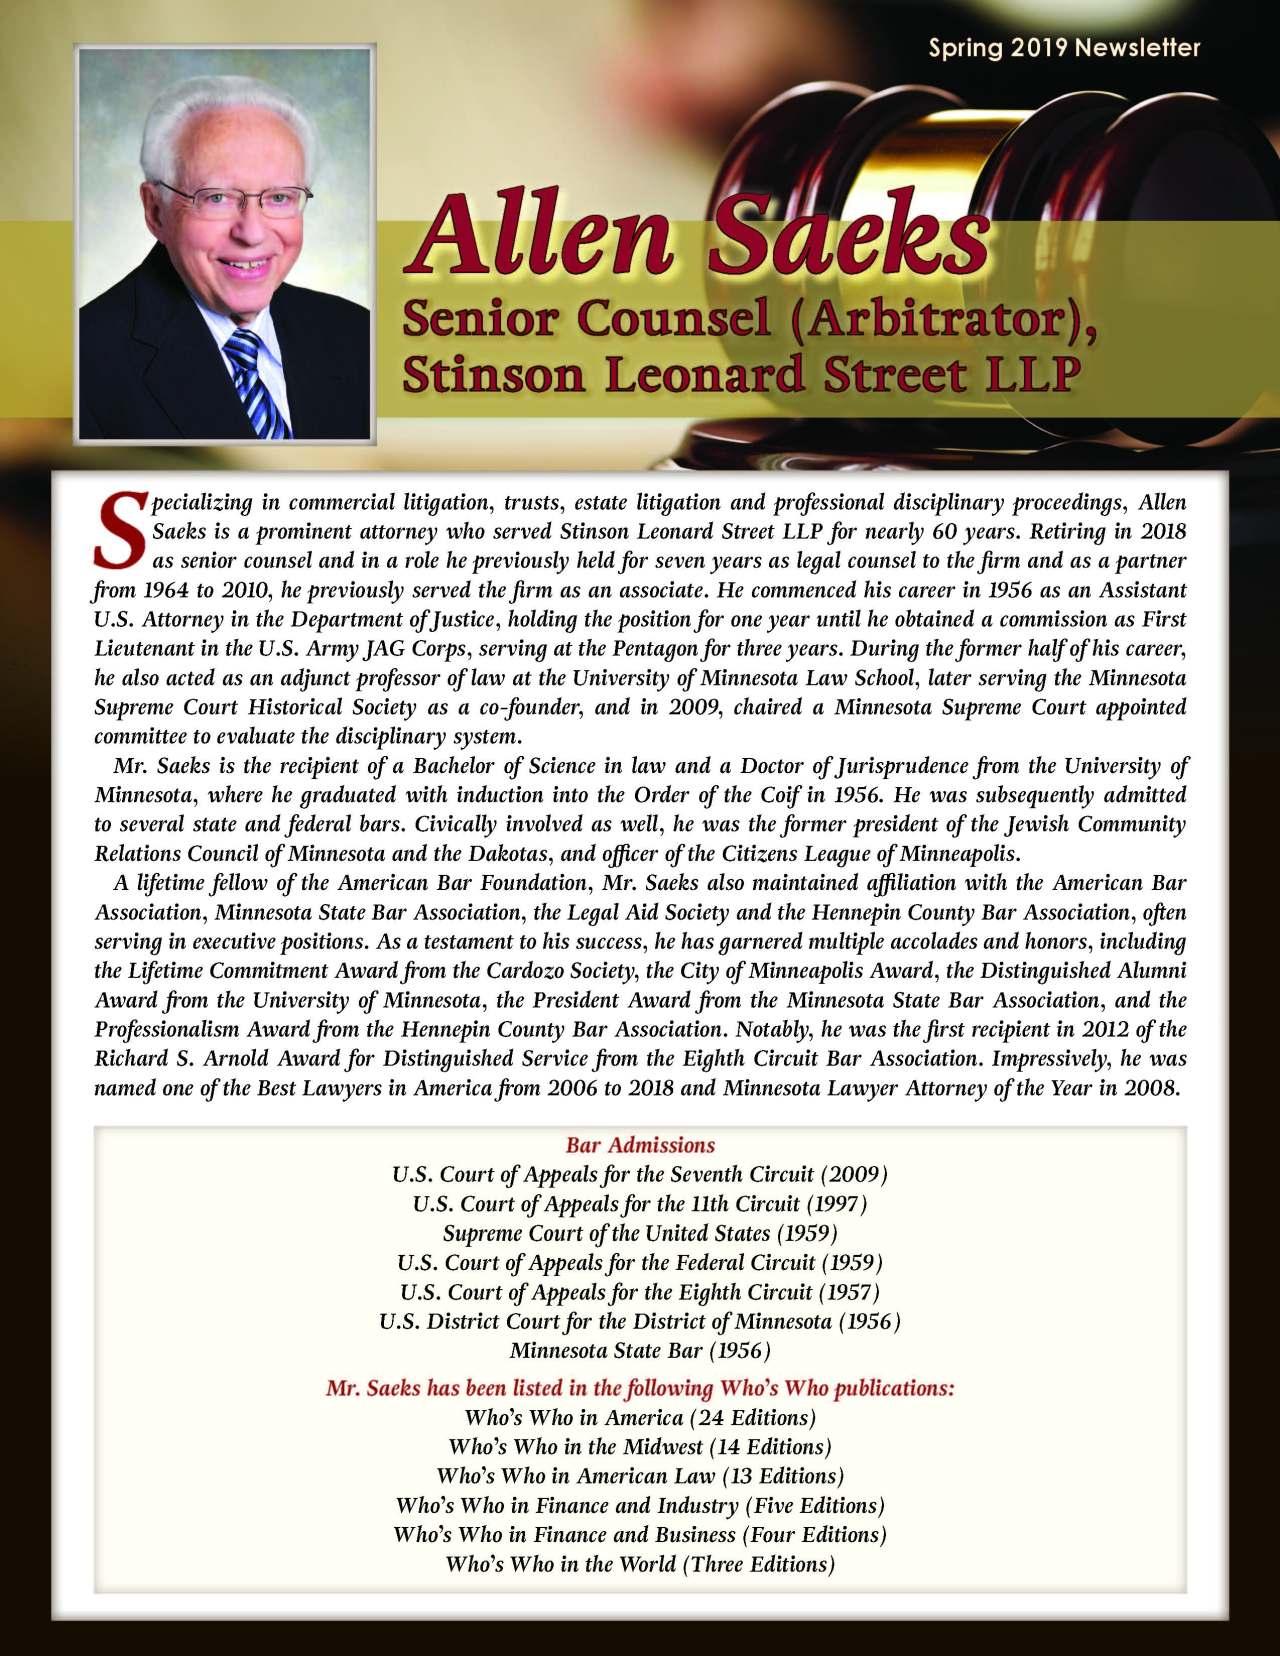 Saeks, Allen 4170715_420130 Newsletter REVISED.jpg